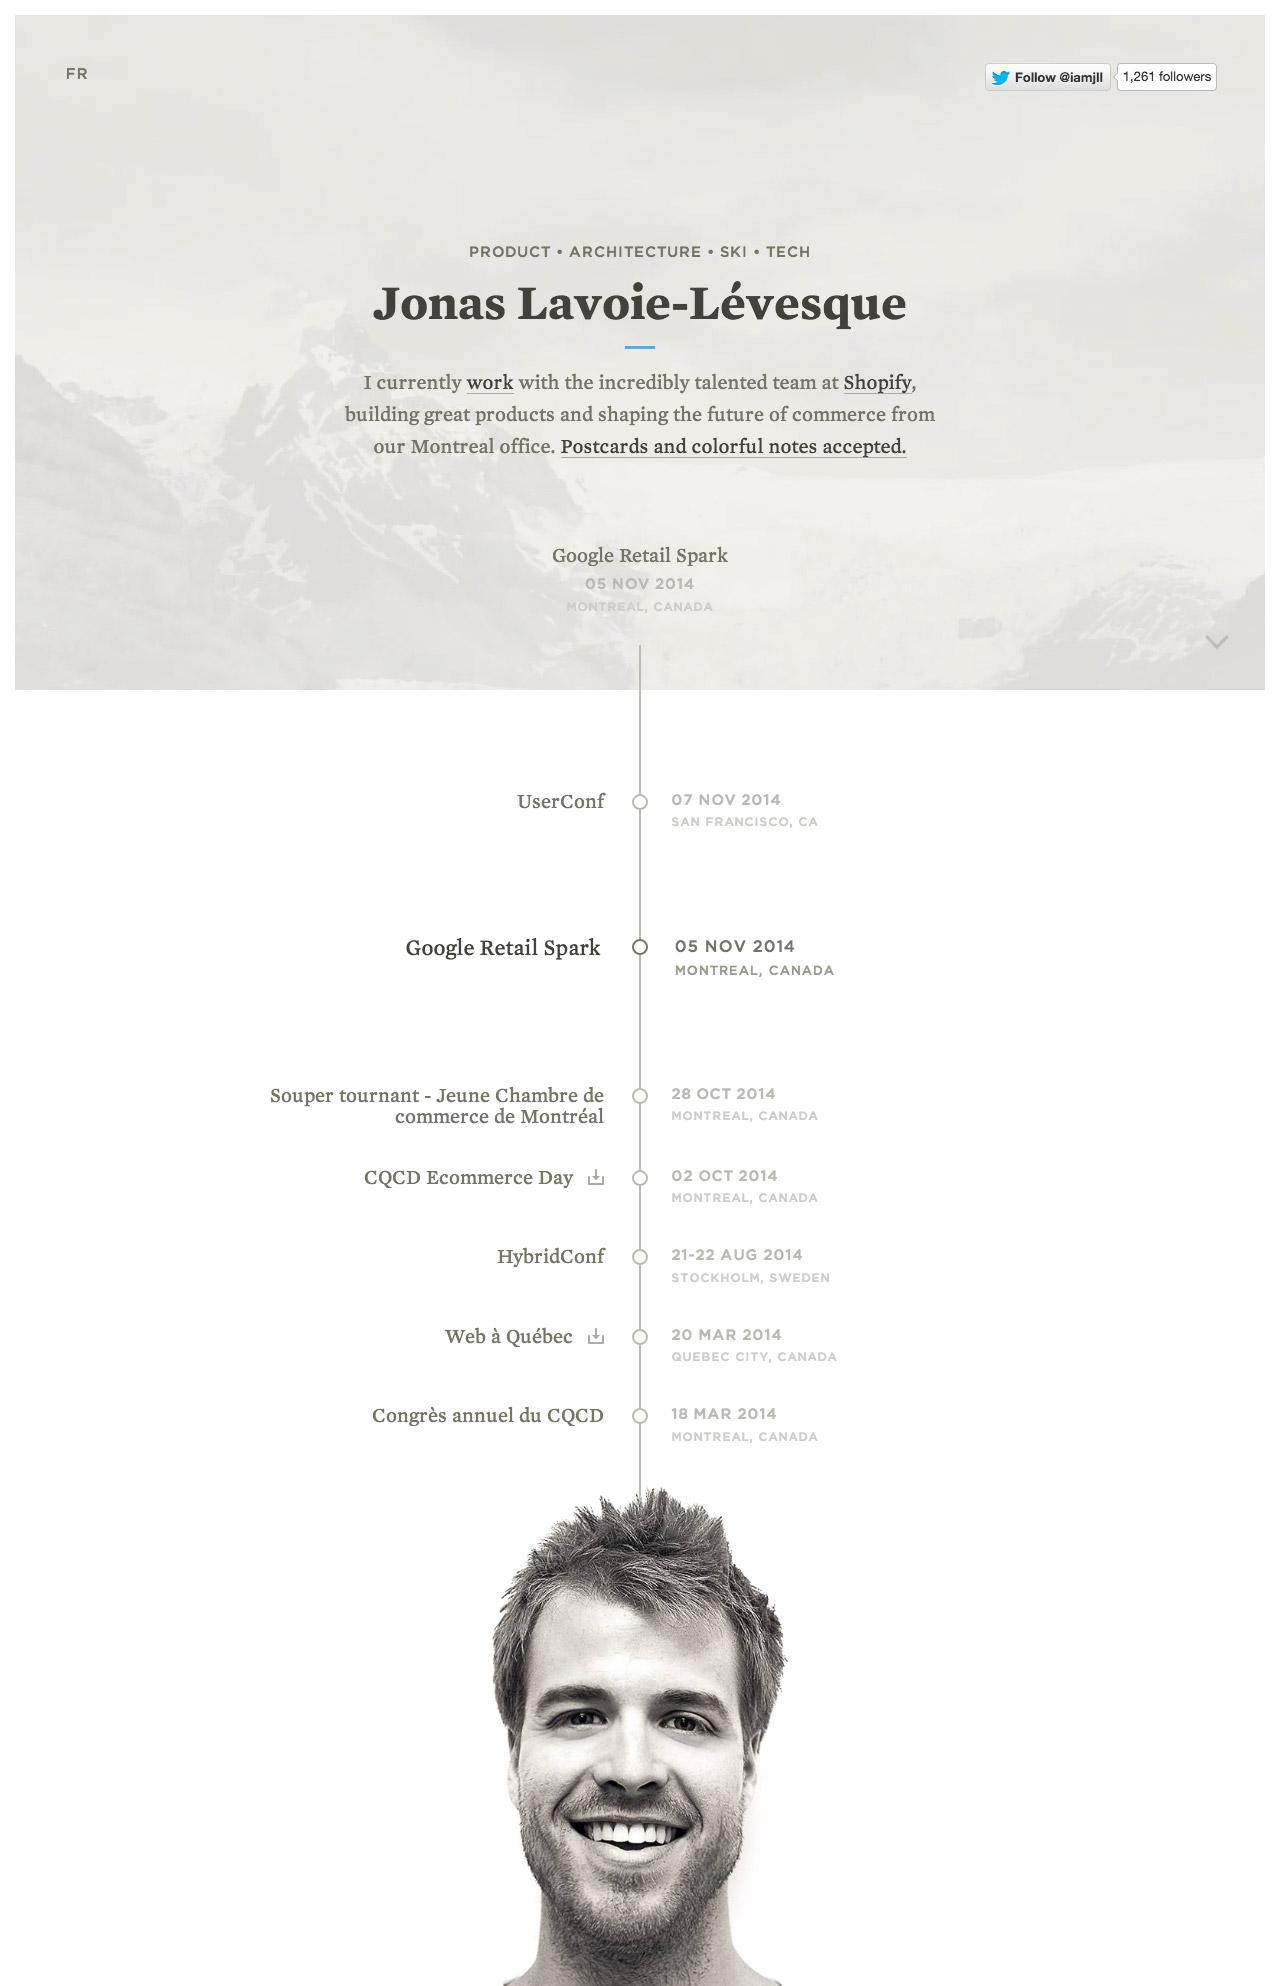 Jonathan Lavoie-Levesque Website Screenshot